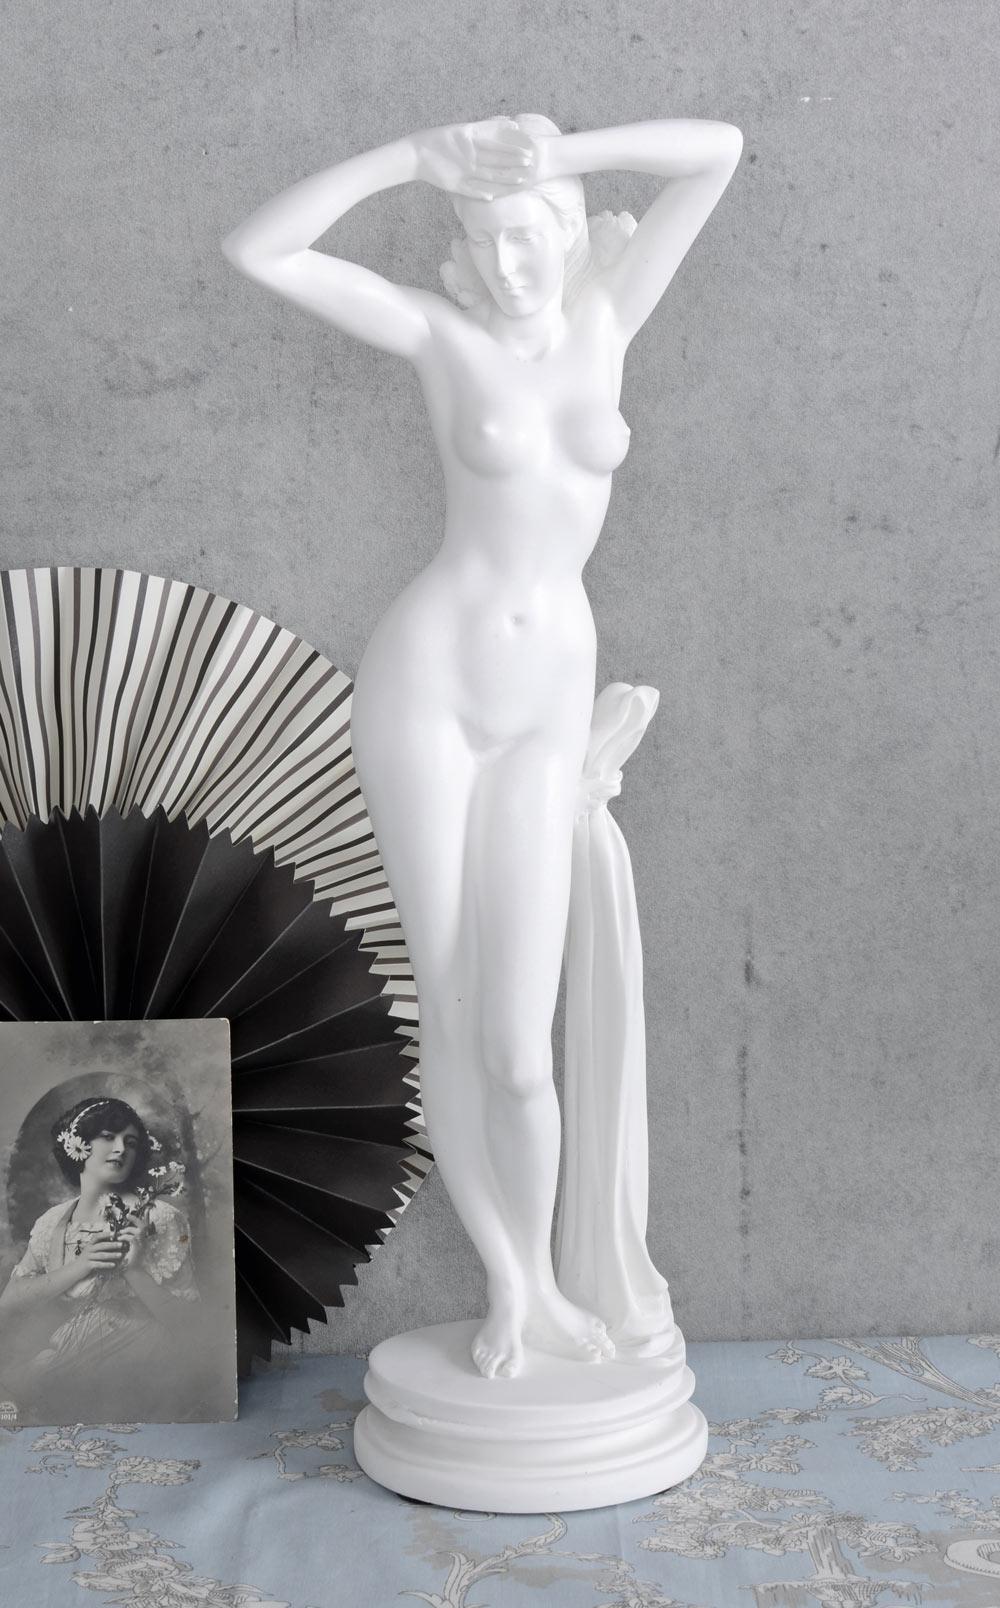 FIGUR FRAUENAKT NACKTE VENUS ANTIKE Aphrodite Frauenfigur Mythologie